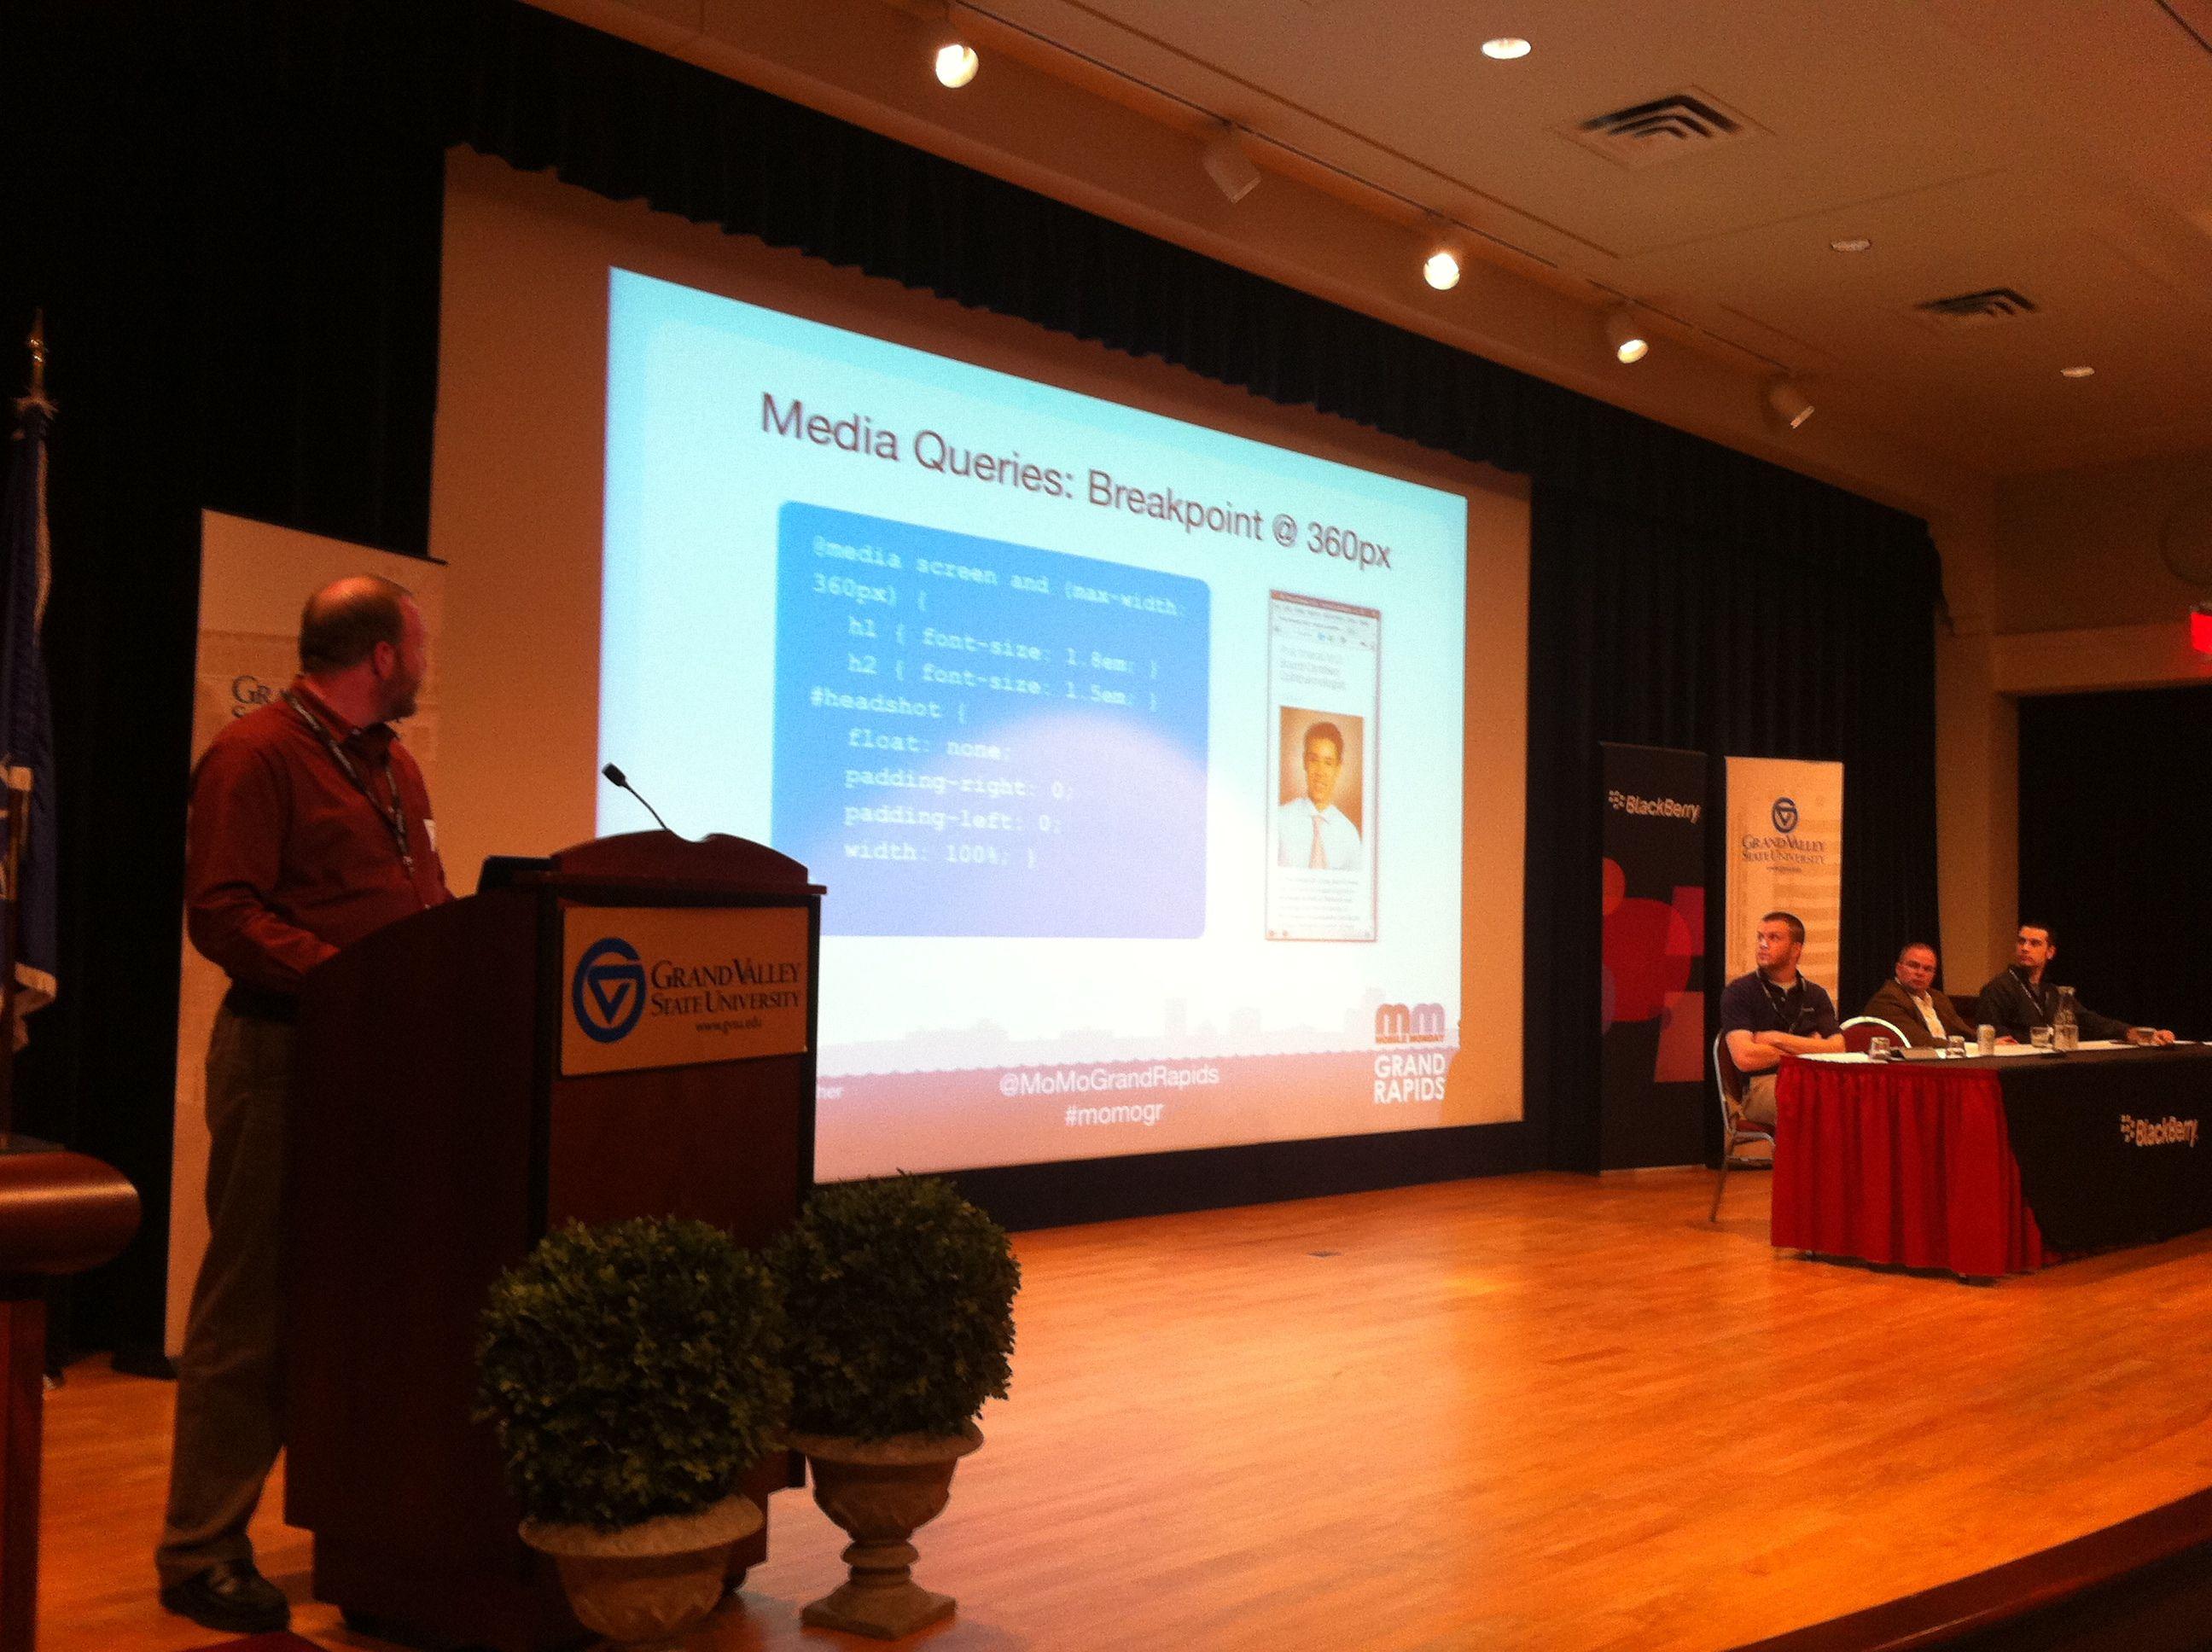 Ben Rousch Presenting at MoMoGR Web Meets Mobile